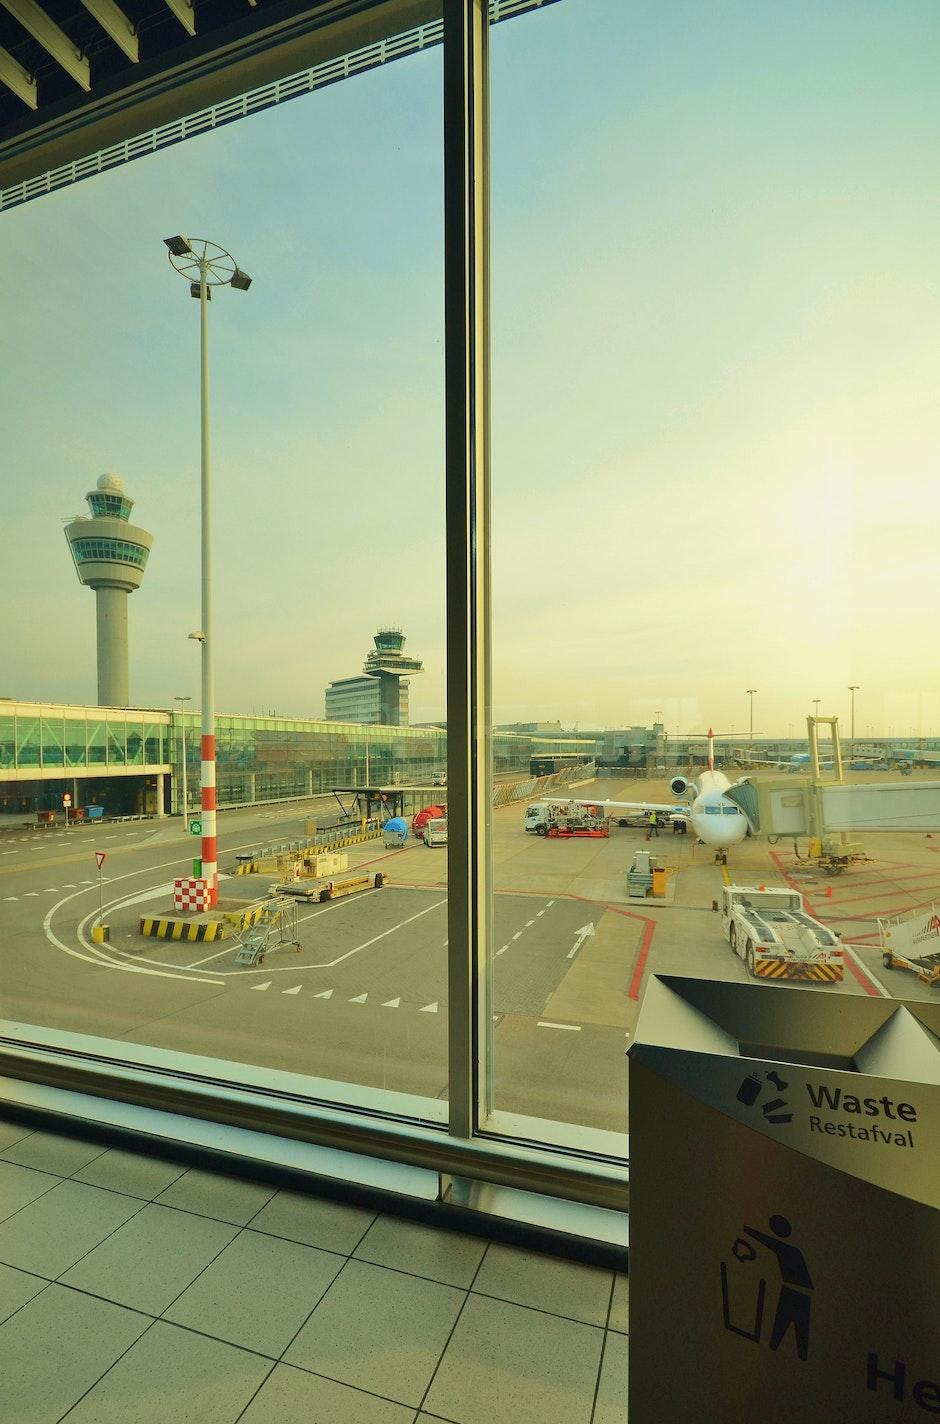 airplane, airport, plane